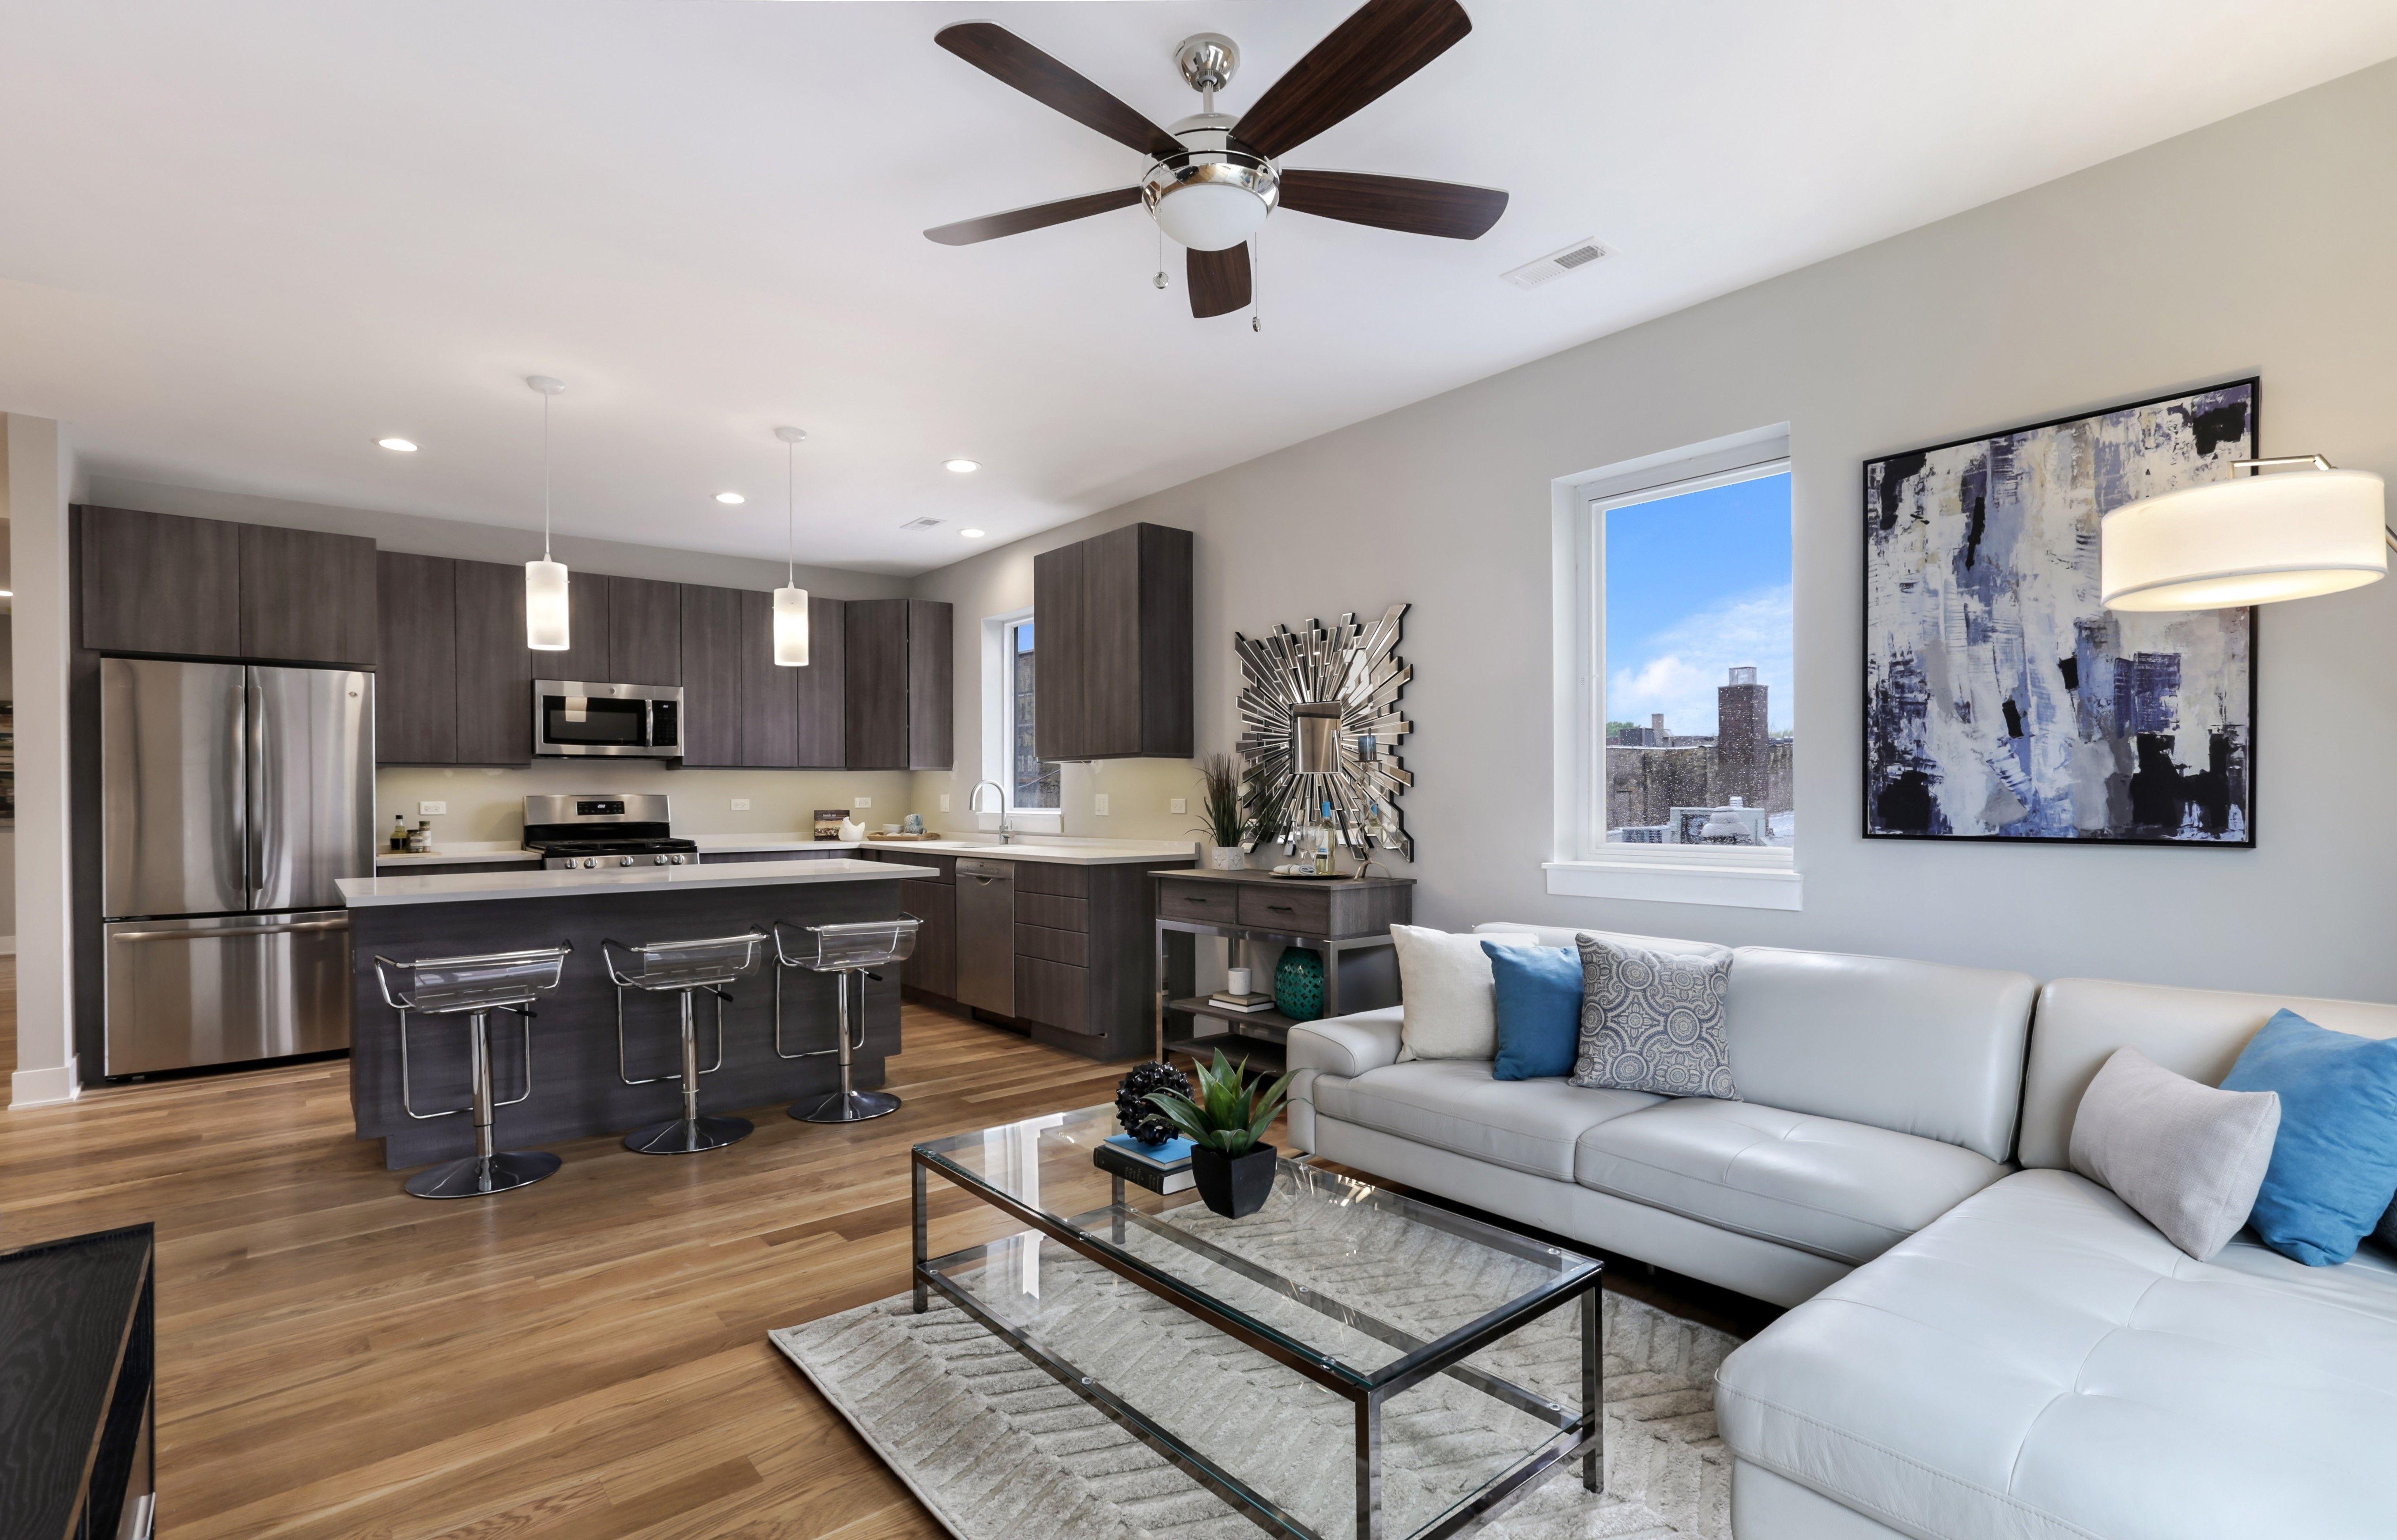 Modern Open Concept Living Room And Kitchen With Recessed Lighting Hardwood Floors Open Concept Living Room Modern Recessed Lighting Apartment Interior Design #recessed #lighting #placement #living #room